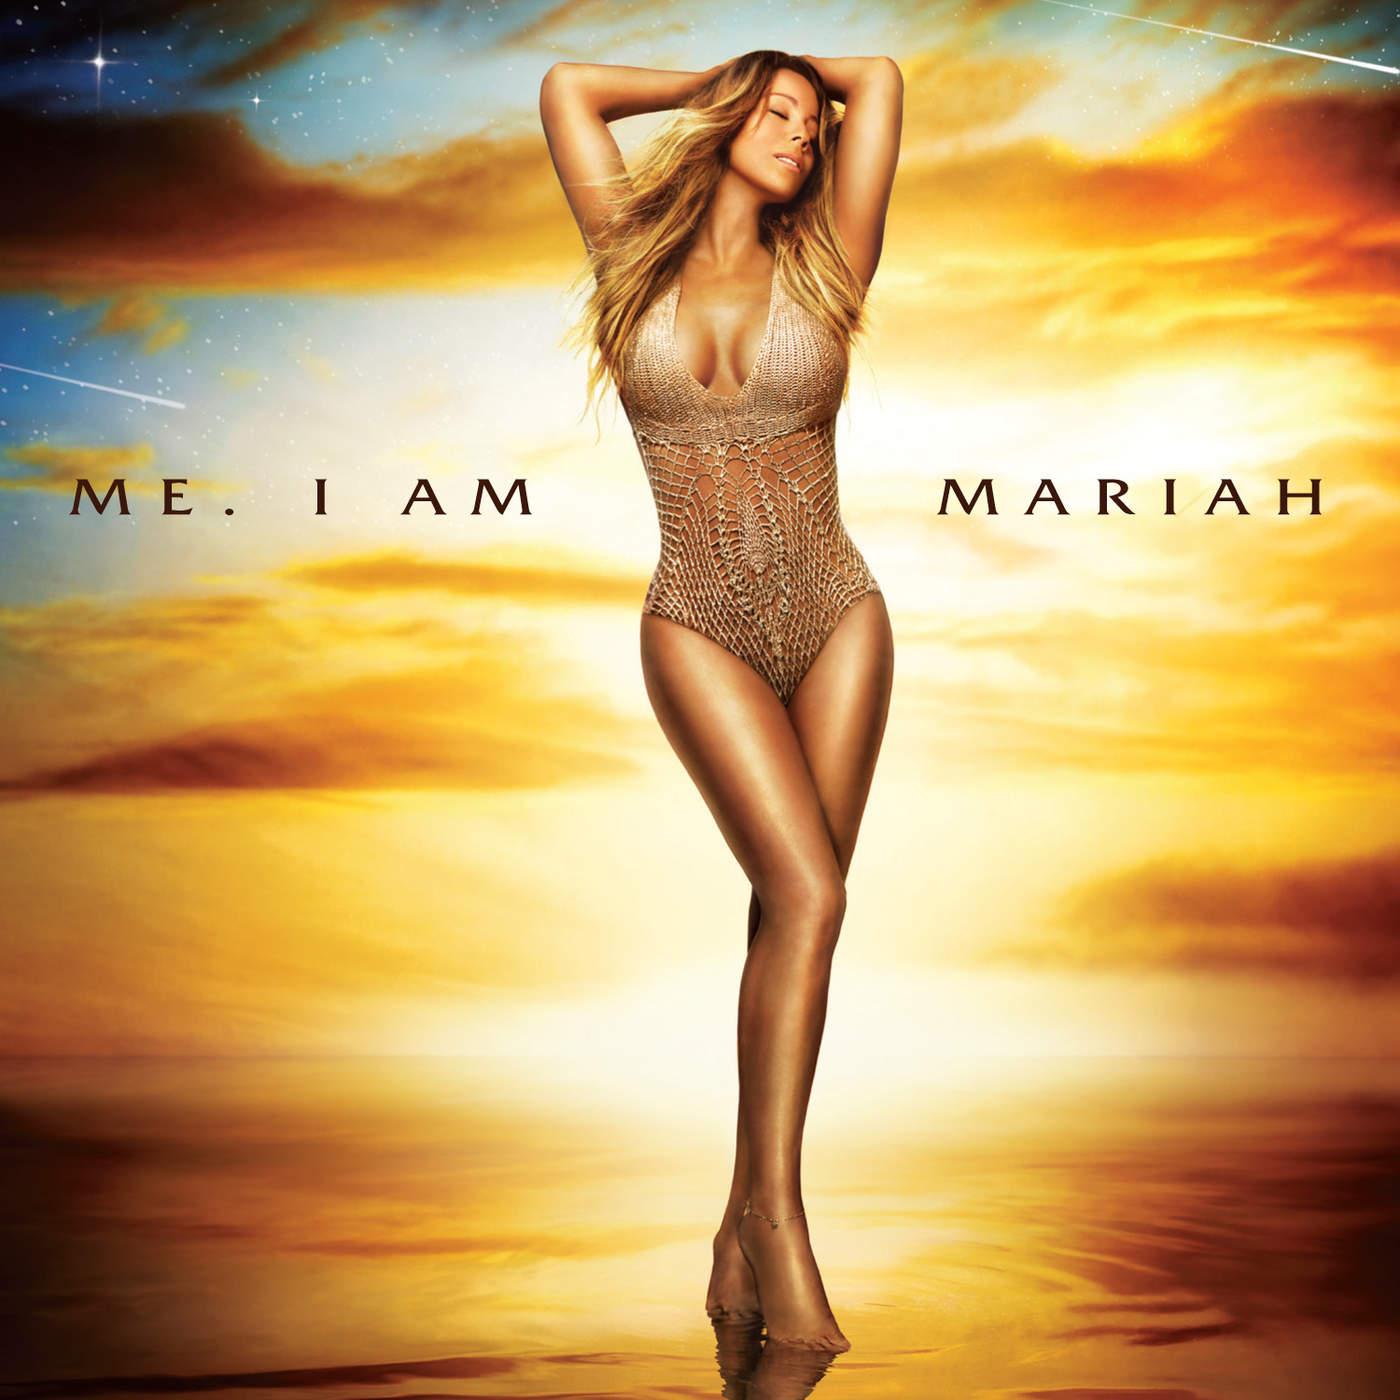 me-i-am-mariah